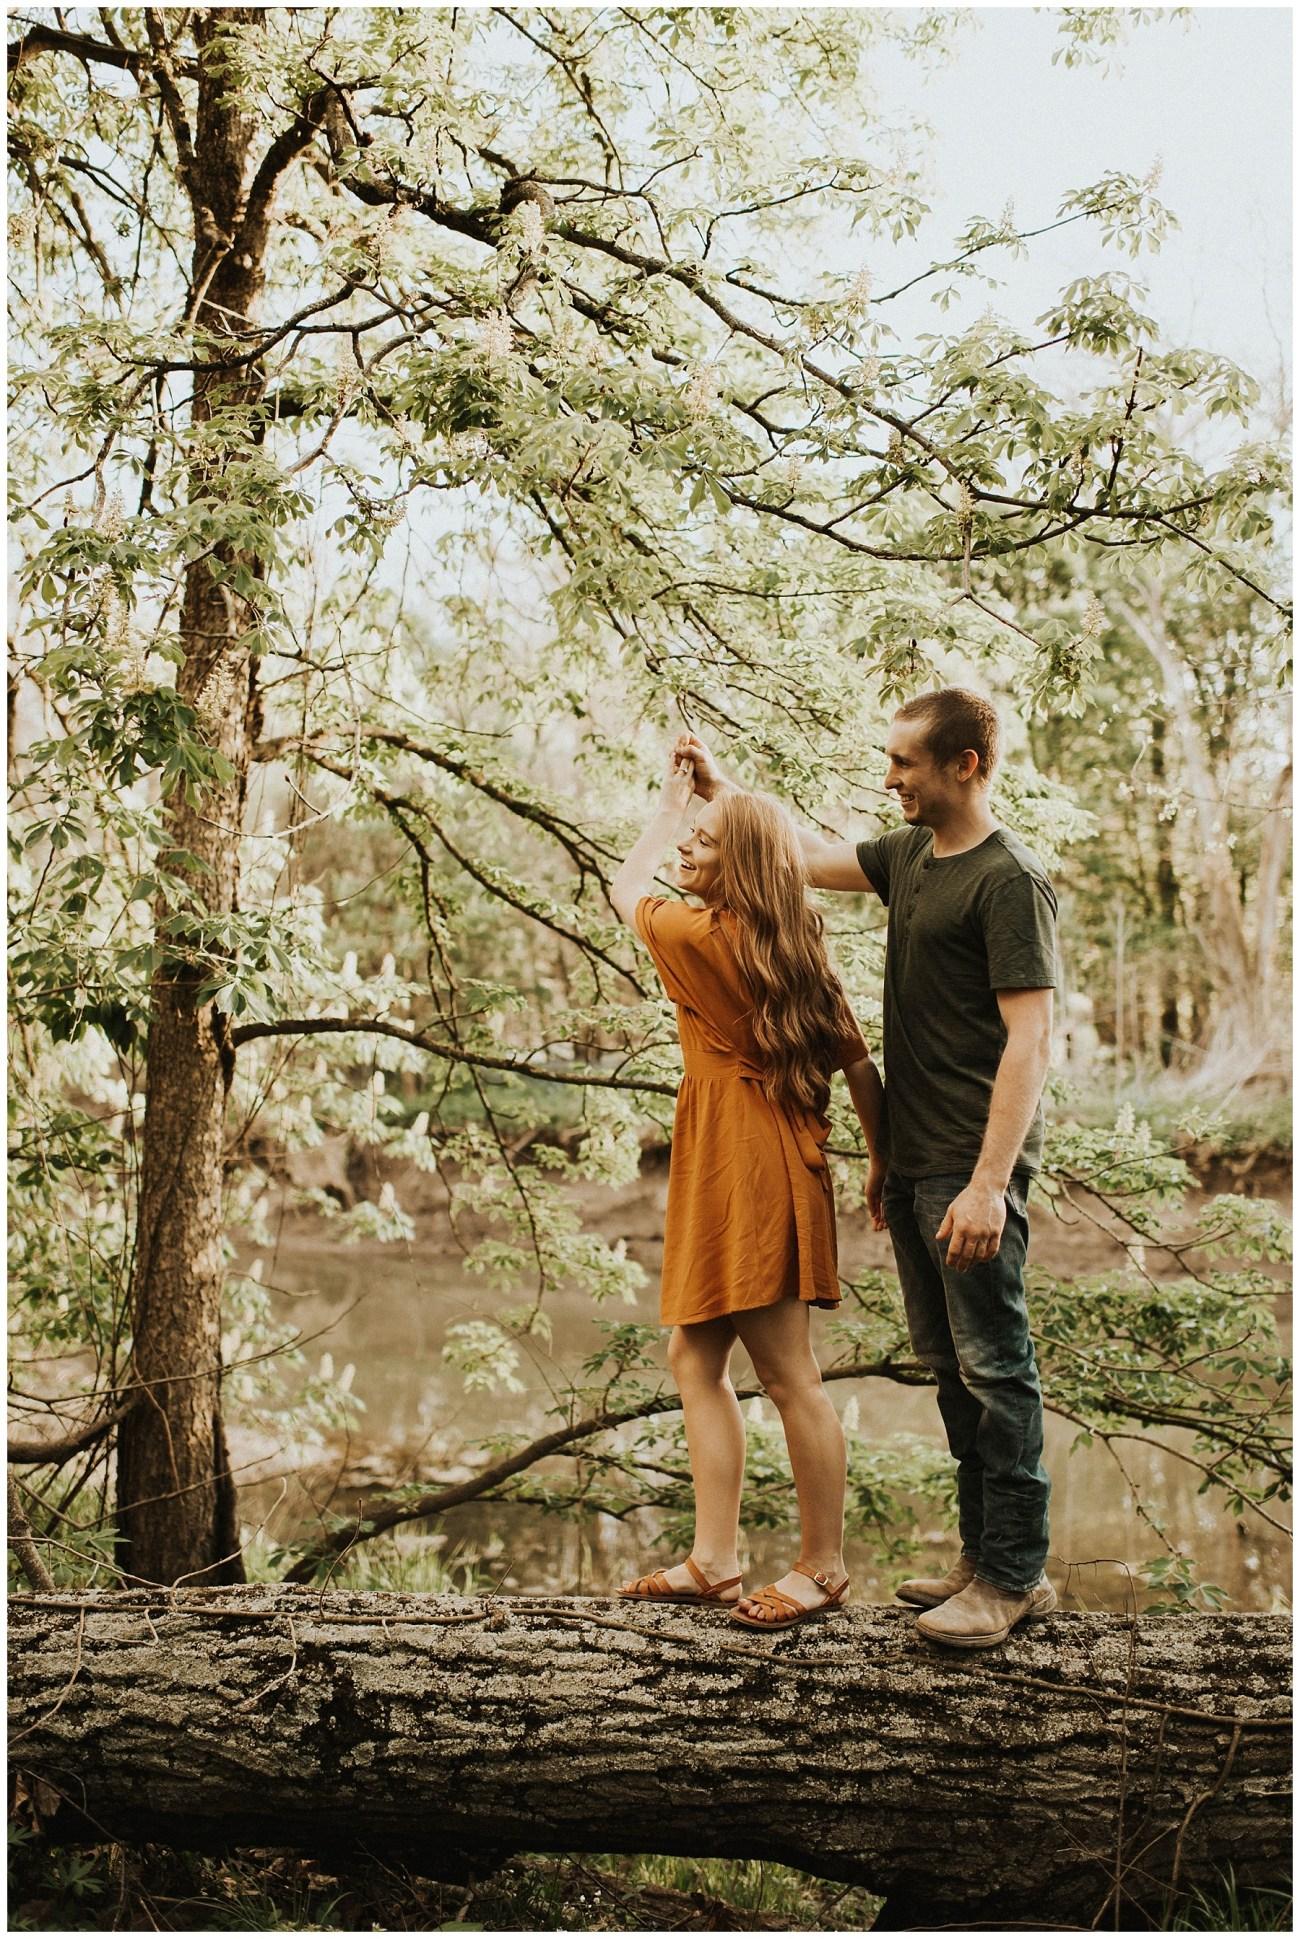 foto de Nelson + Kendra // Warm Summer Engagements - Lauren F.otography ...